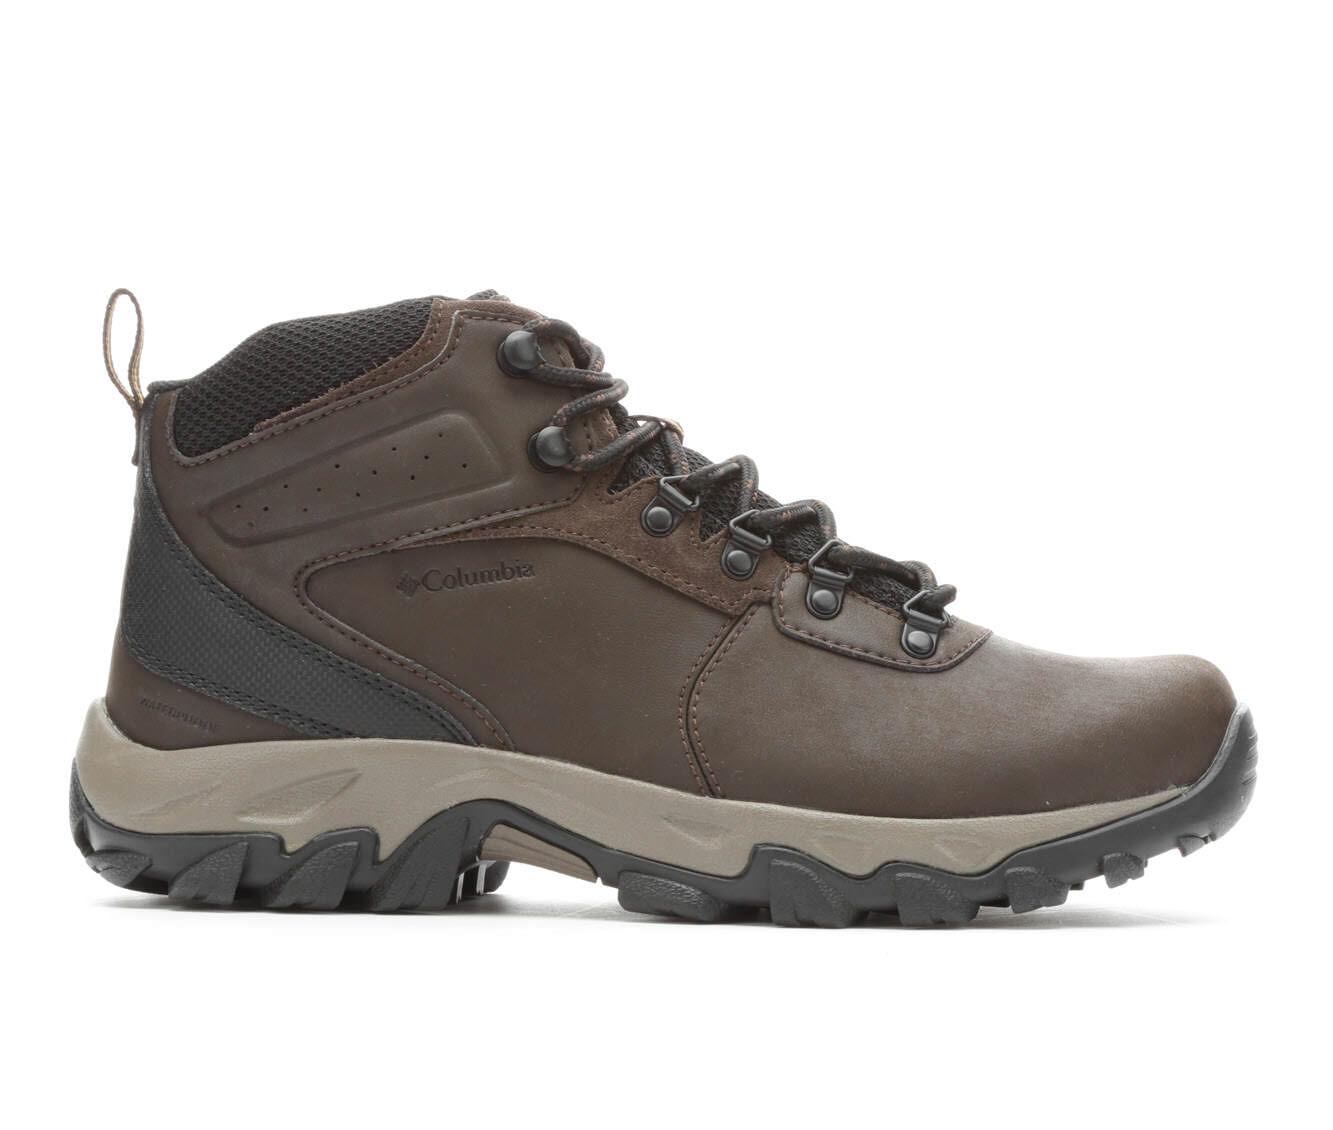 Men's Columbia Newton Ridge Plus II Waterproof Hiking Boots Cordovan/Squash